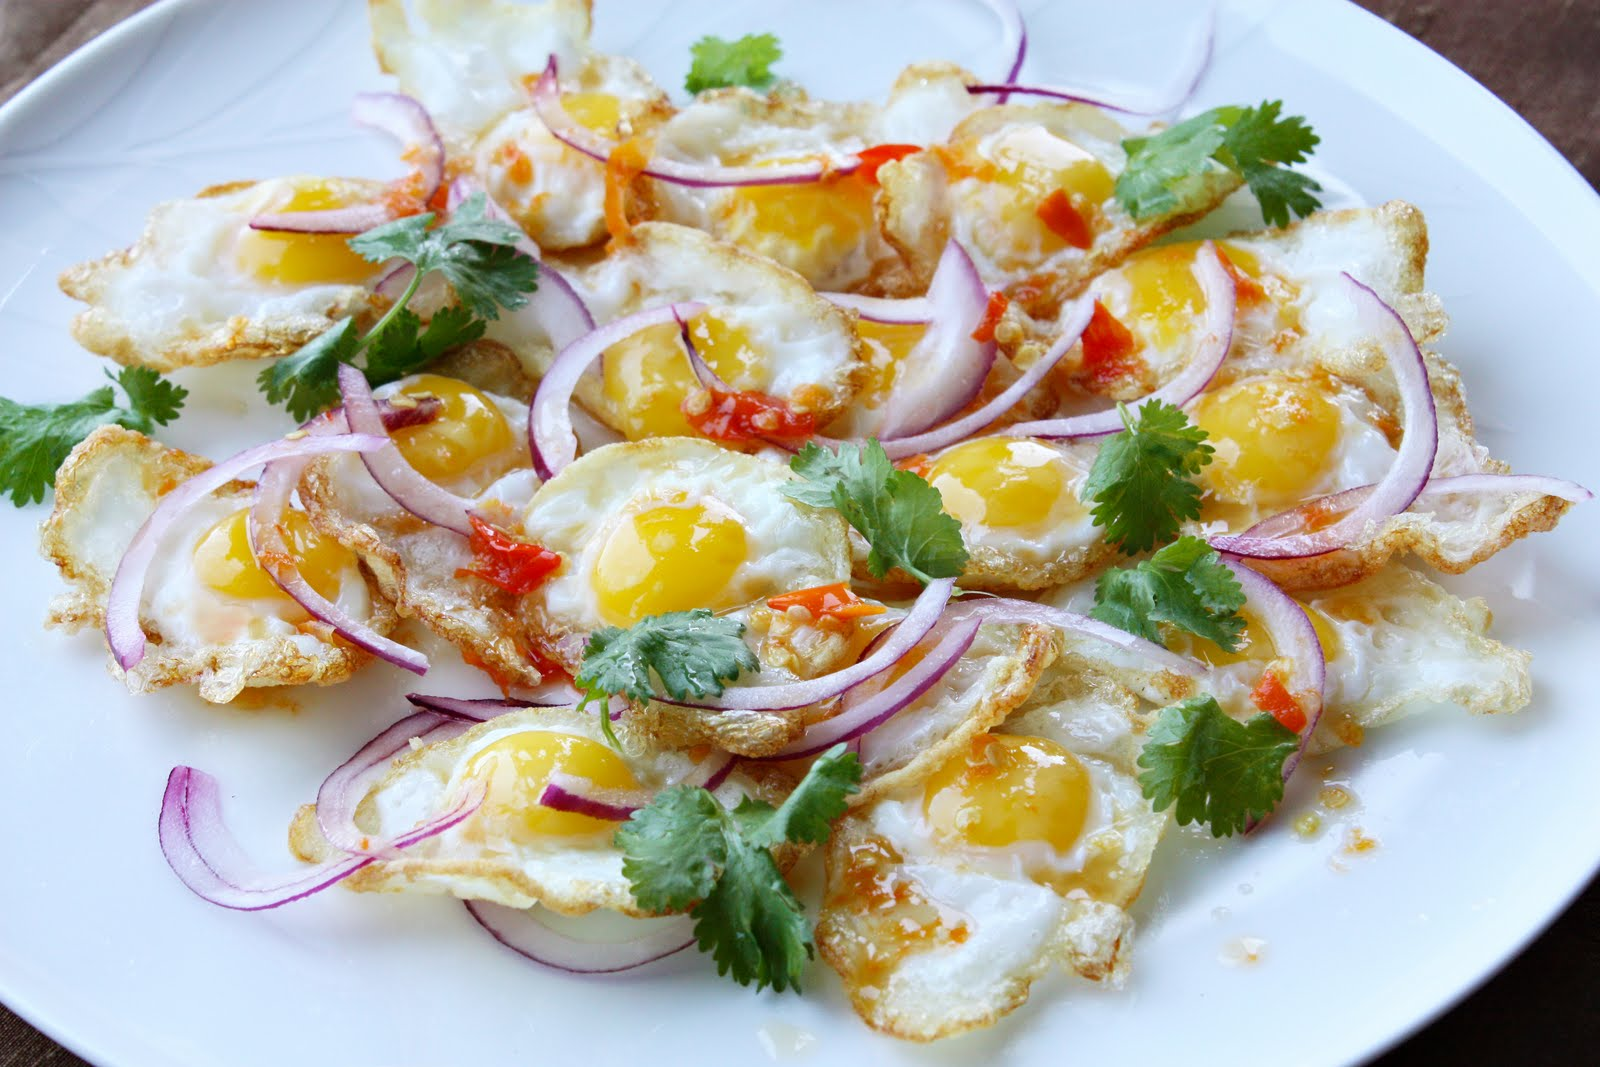 Tasty Thai Food Recipes: Easy egg salad: Spicy fried egg salad